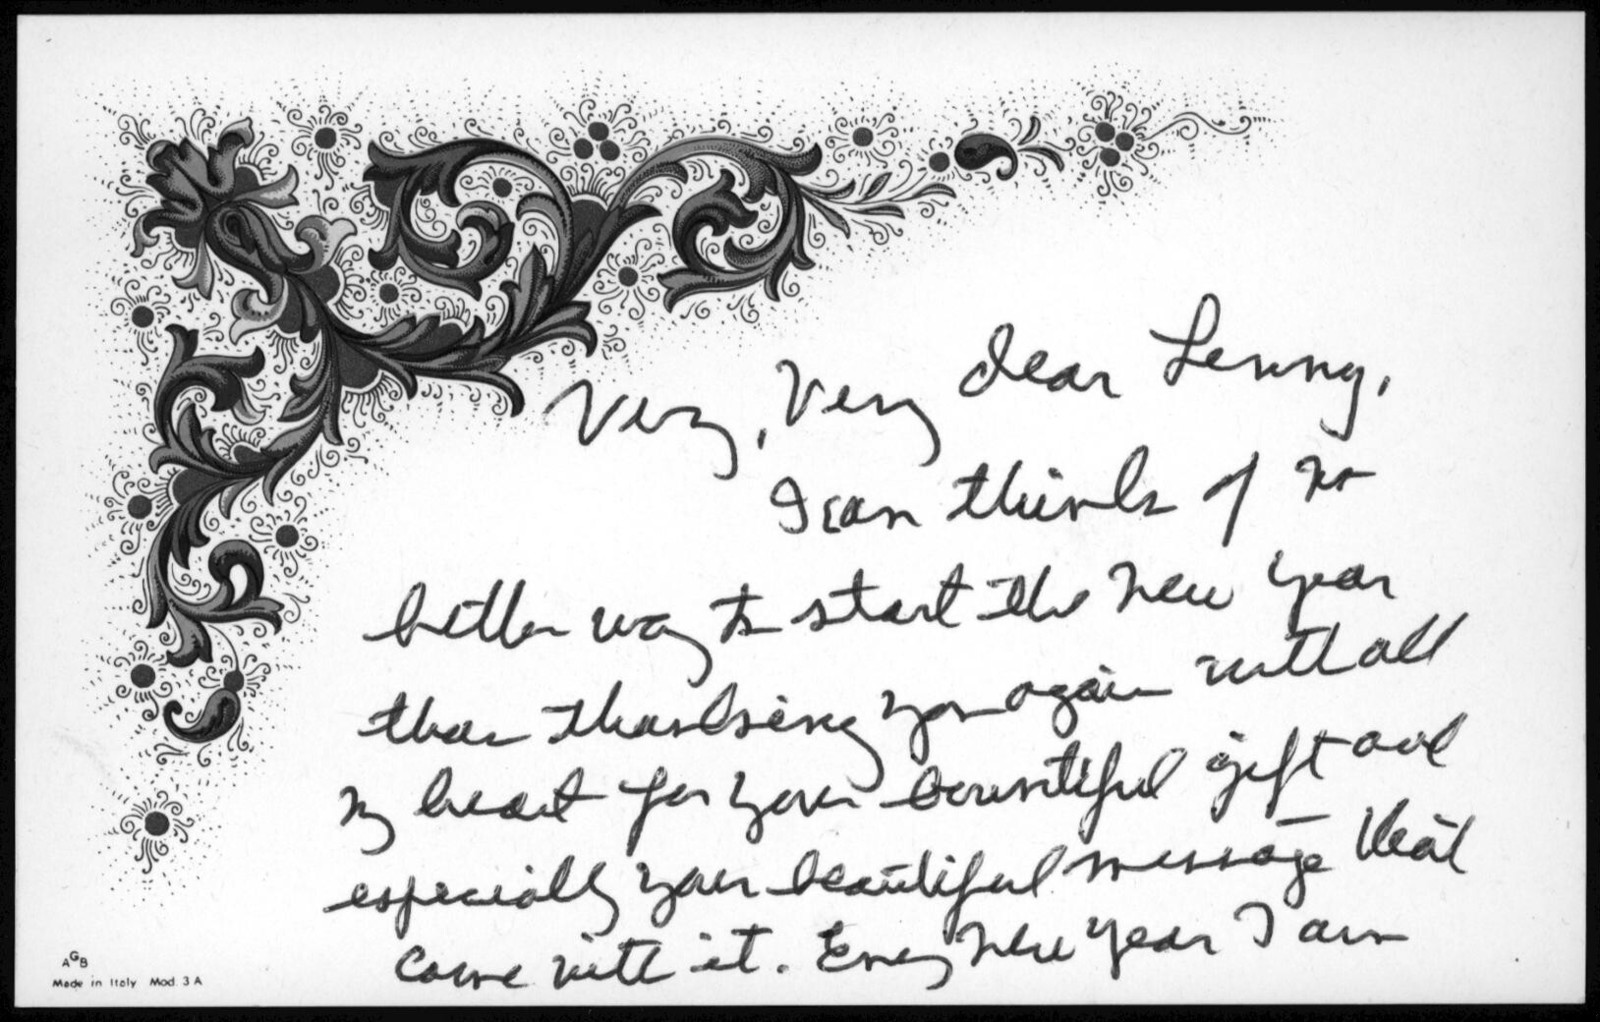 Letter from Helen Coates to Leonard Bernstein, January 1, 1981